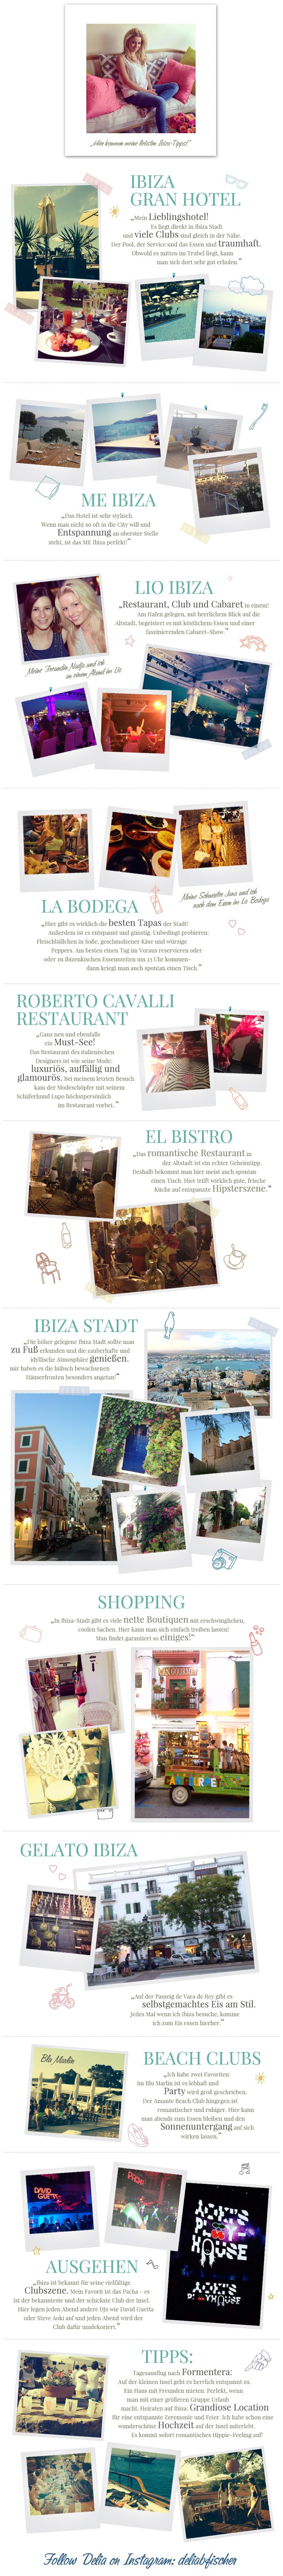 Delia-Fischers-Ibiza